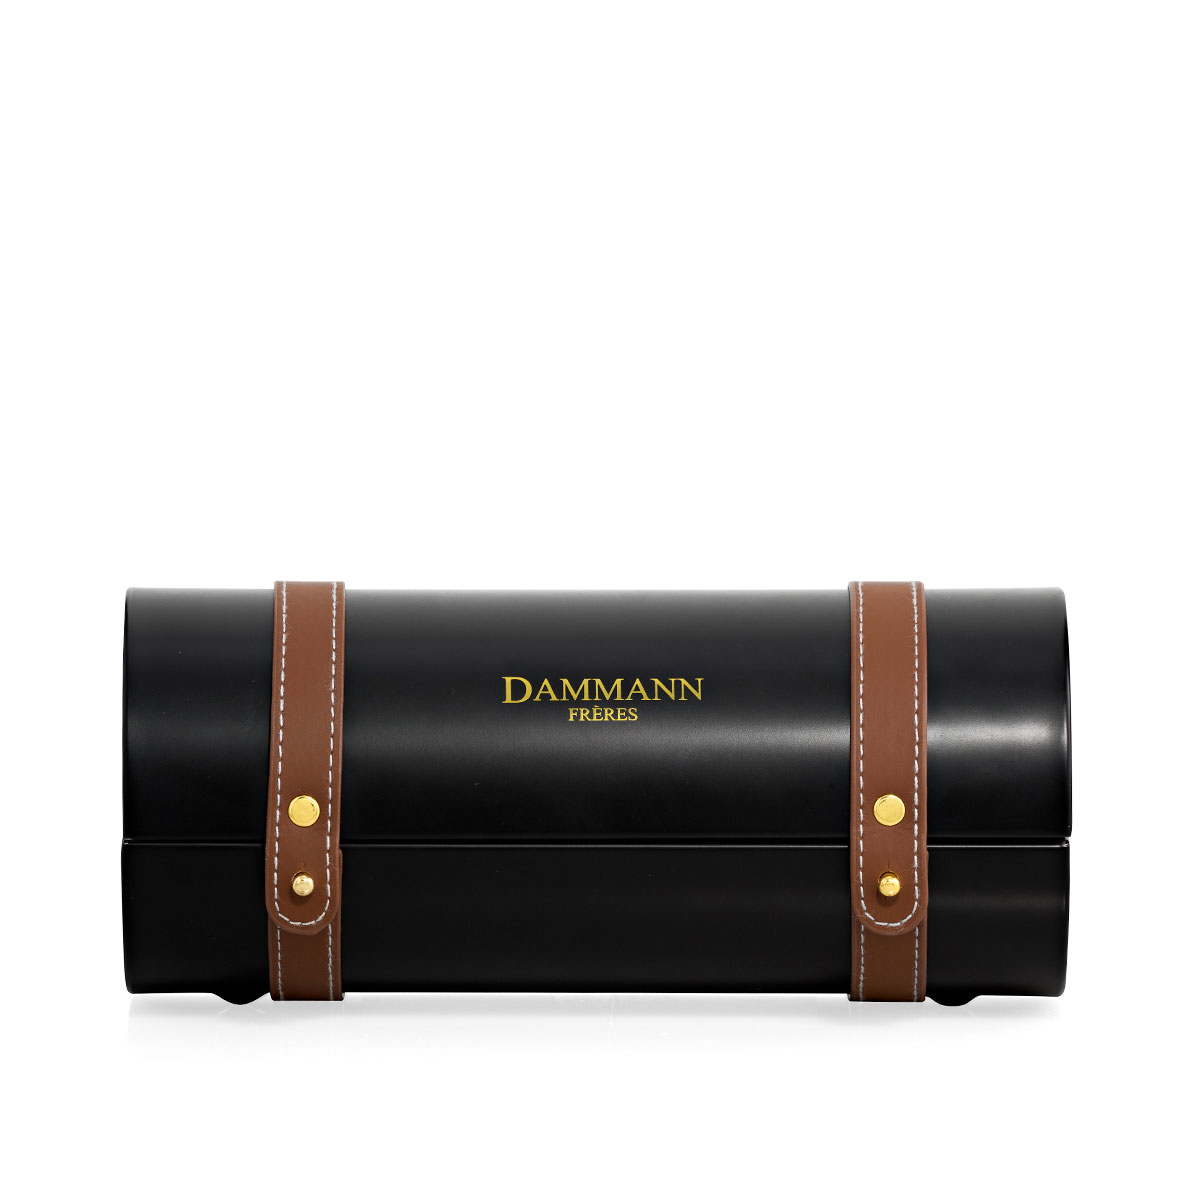 dammann coffret th 39 merveilleux 39 cadofrance. Black Bedroom Furniture Sets. Home Design Ideas